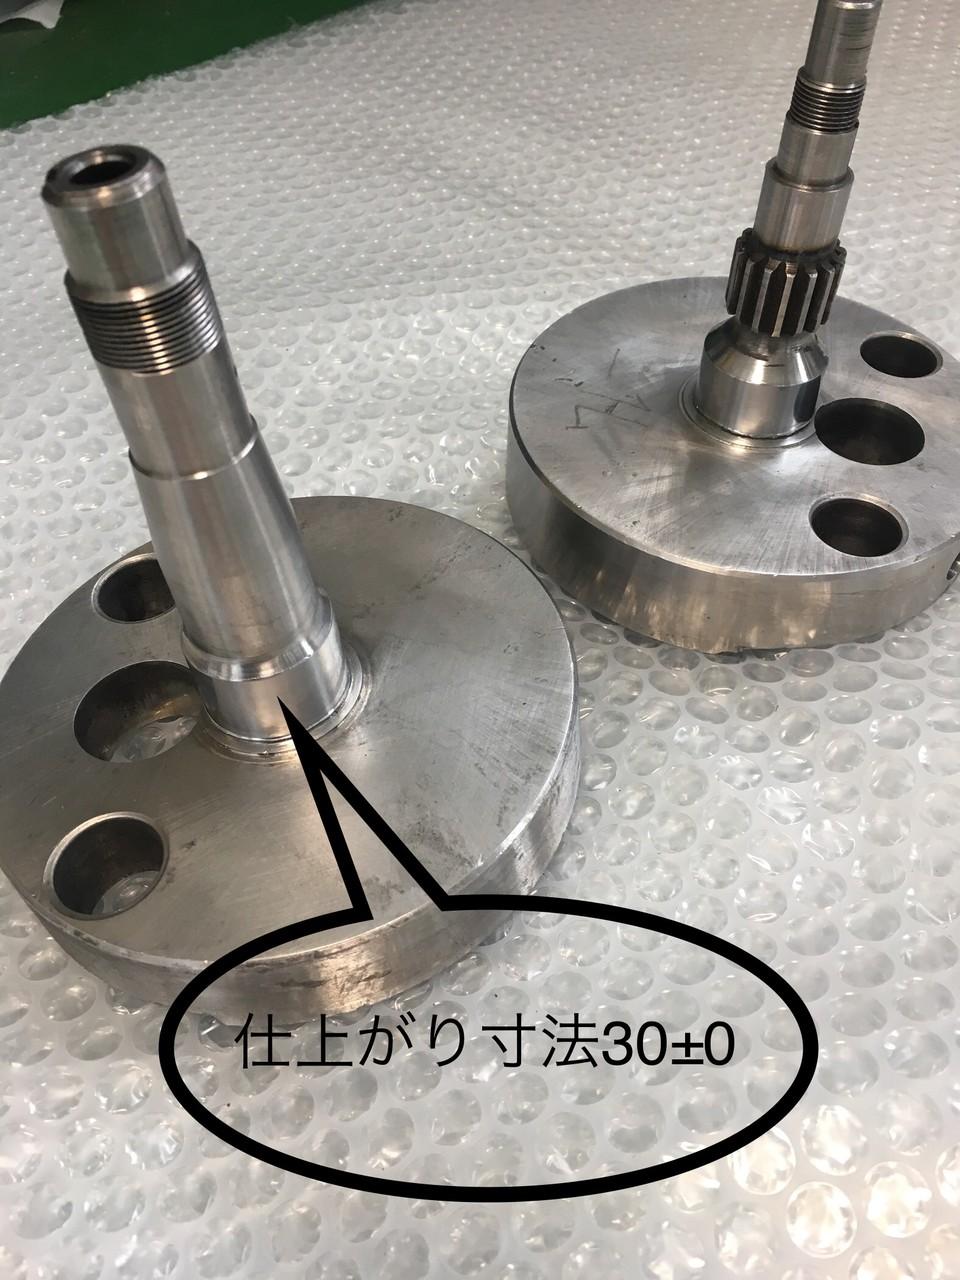 D3EB6CD8-277B-4864-BFE1-0D053063A66E